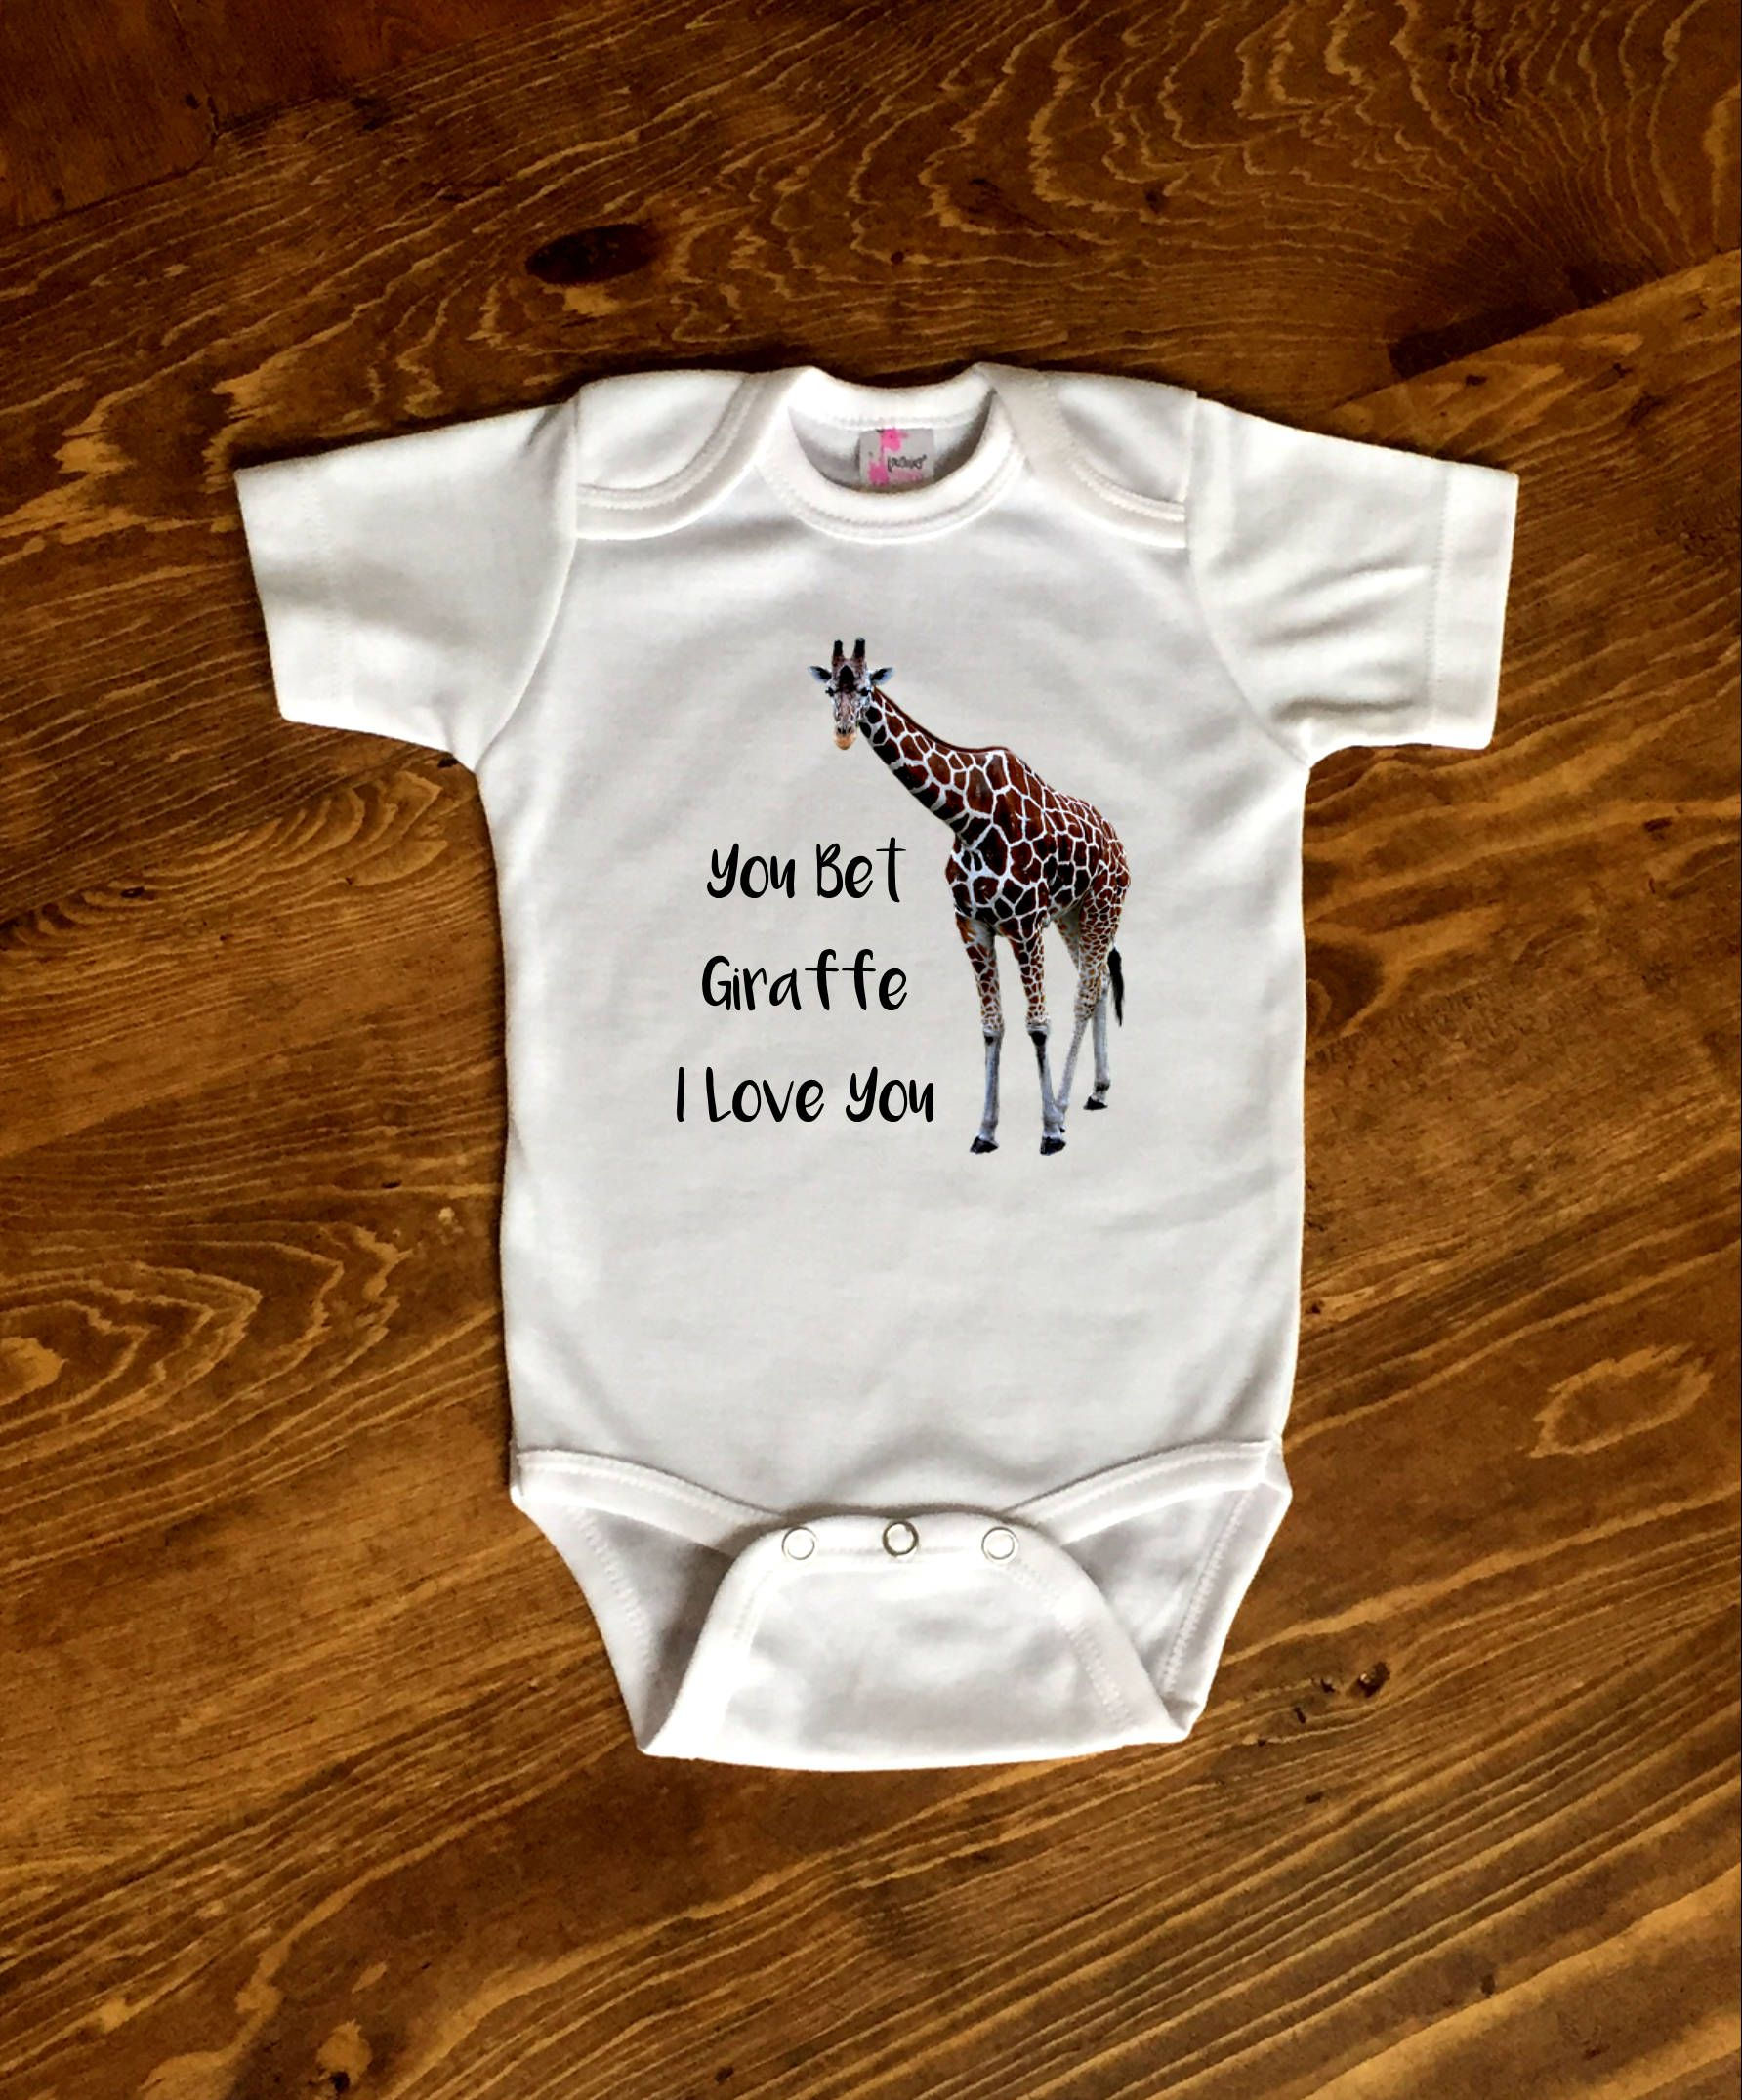 81a21f7a8 Giraffe Baby Clothes, Giraffe Baby Shower, Giraffe Baby Gift, Giraffe  Bodysuit, Giraffe Baby Boy, Giraffe Baby Girl, Giraffe Baby Onesie Outfit  by ...